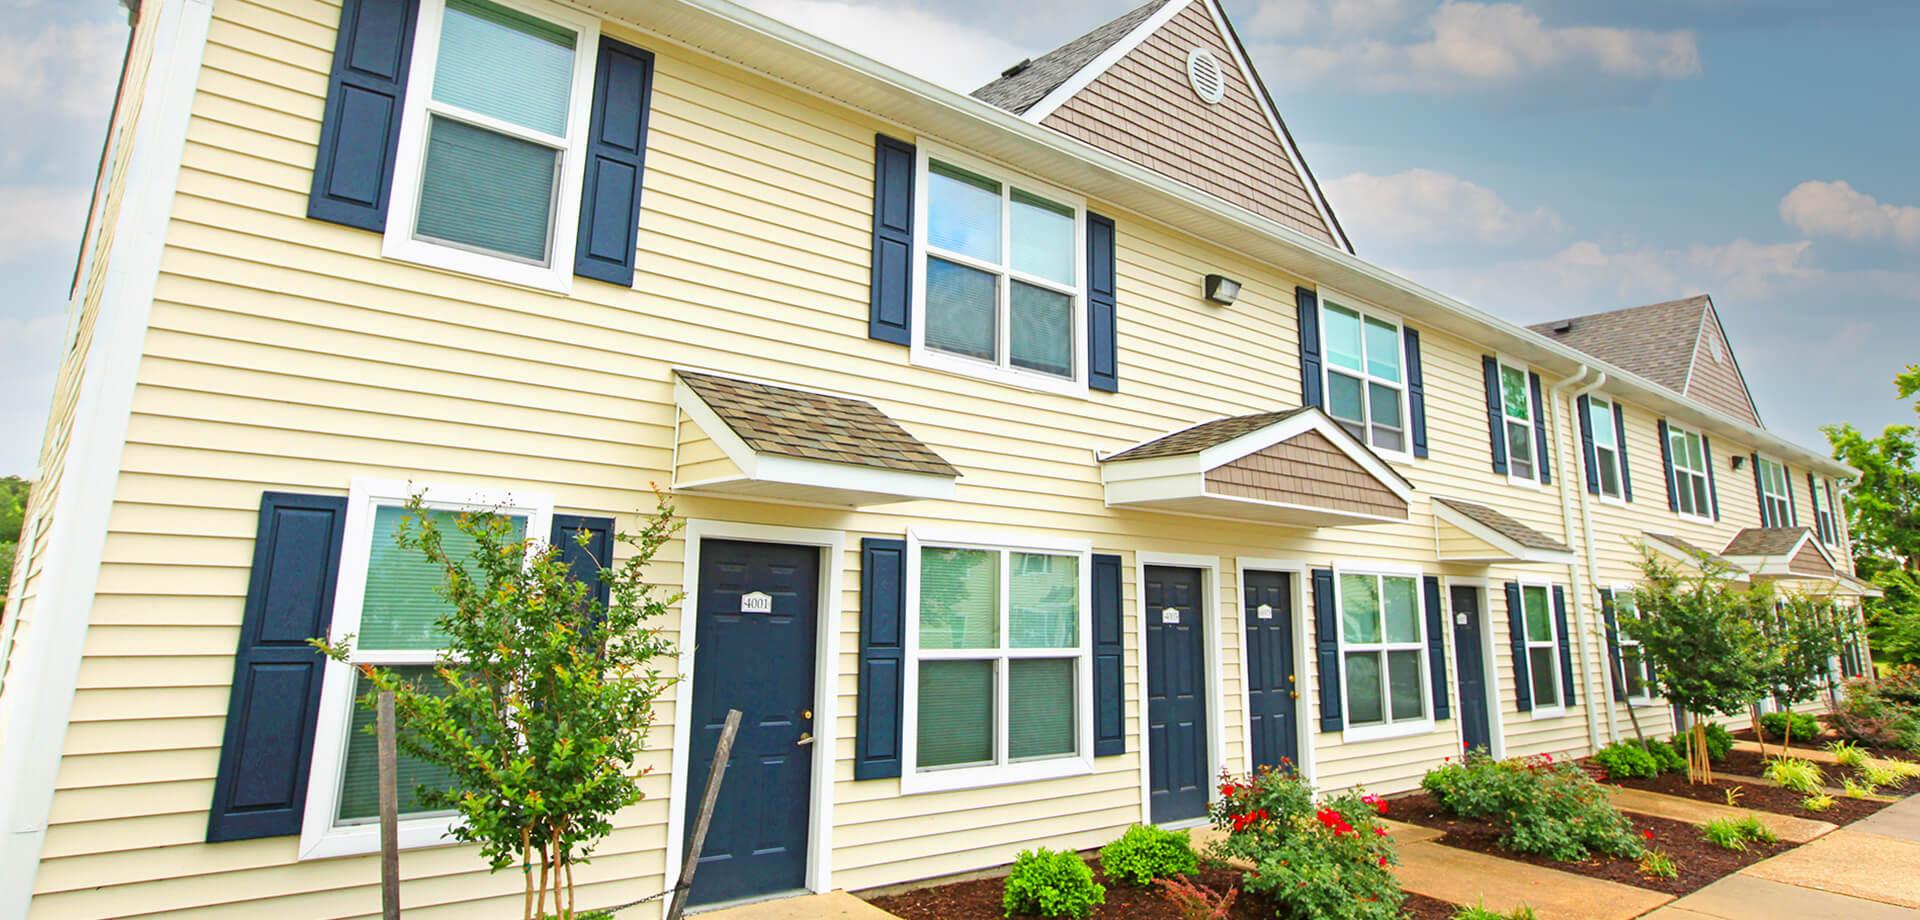 Maplewood Apartments Apartment Homes Slideshow Image